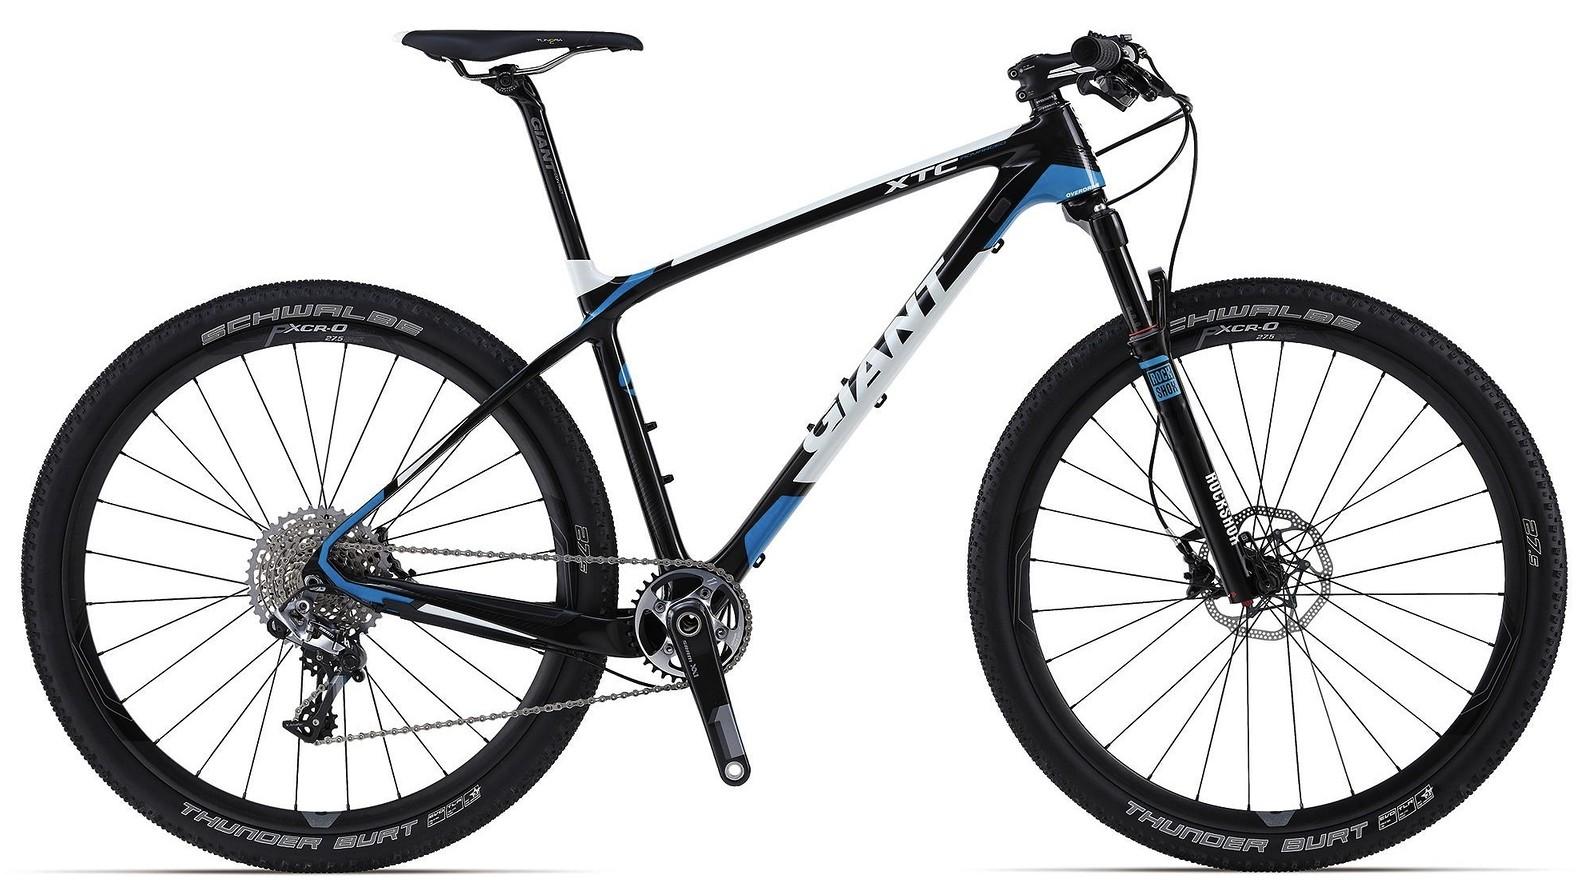 2014 Giant XTC Advanced 27.5 0 Team Bike XtC_Advanced_27.5_0_Team